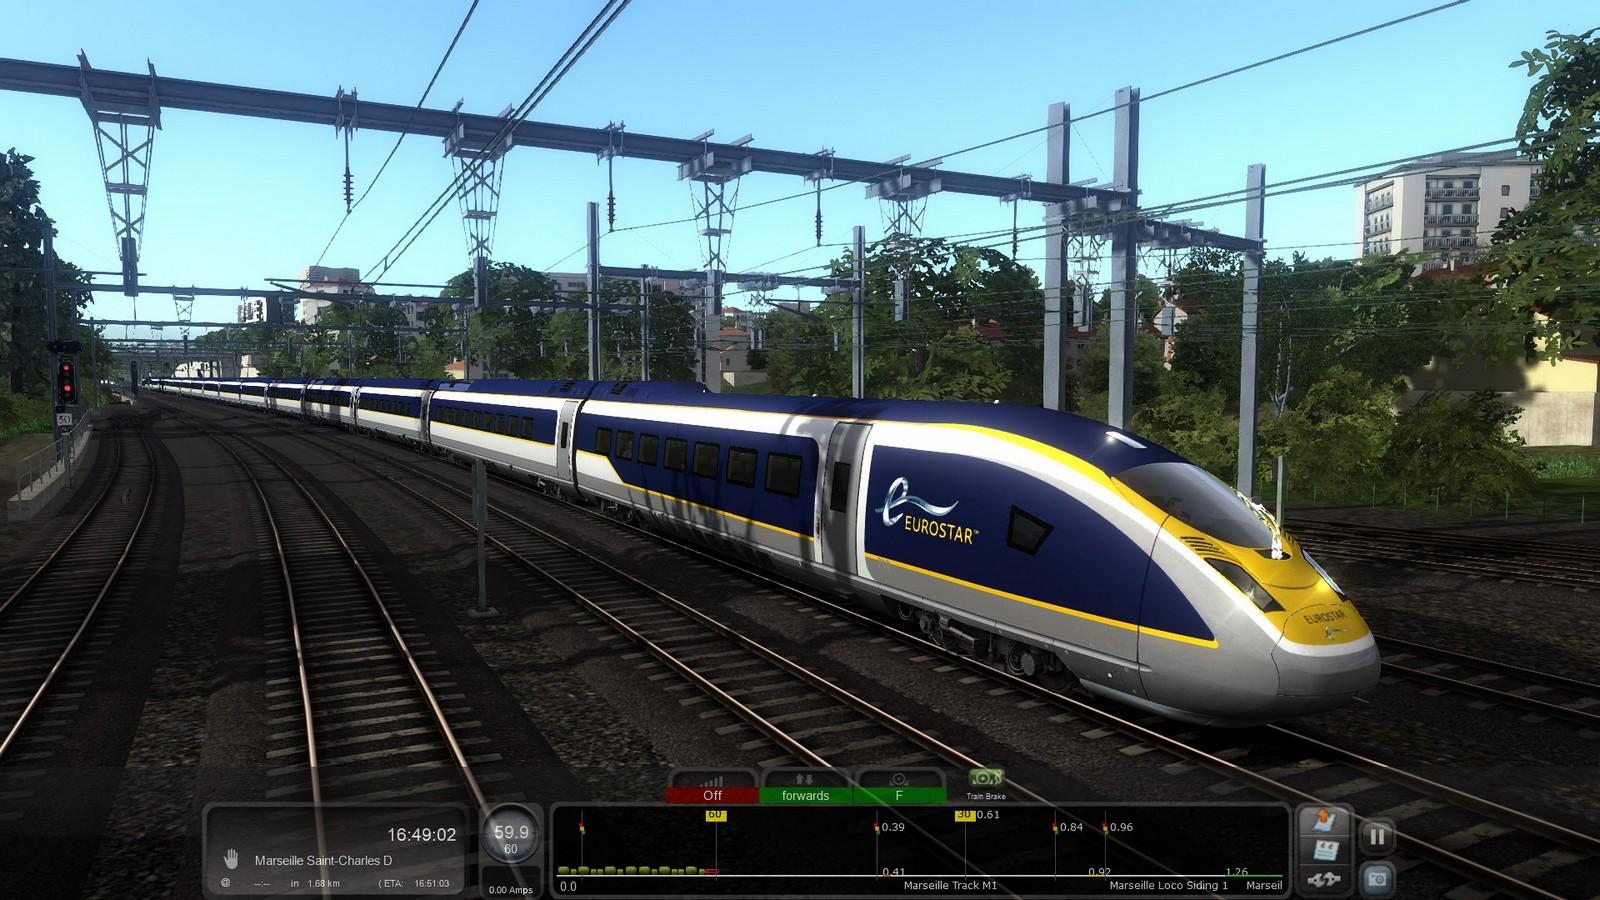 Class-374-e320-LYD-MSC-26.jpg